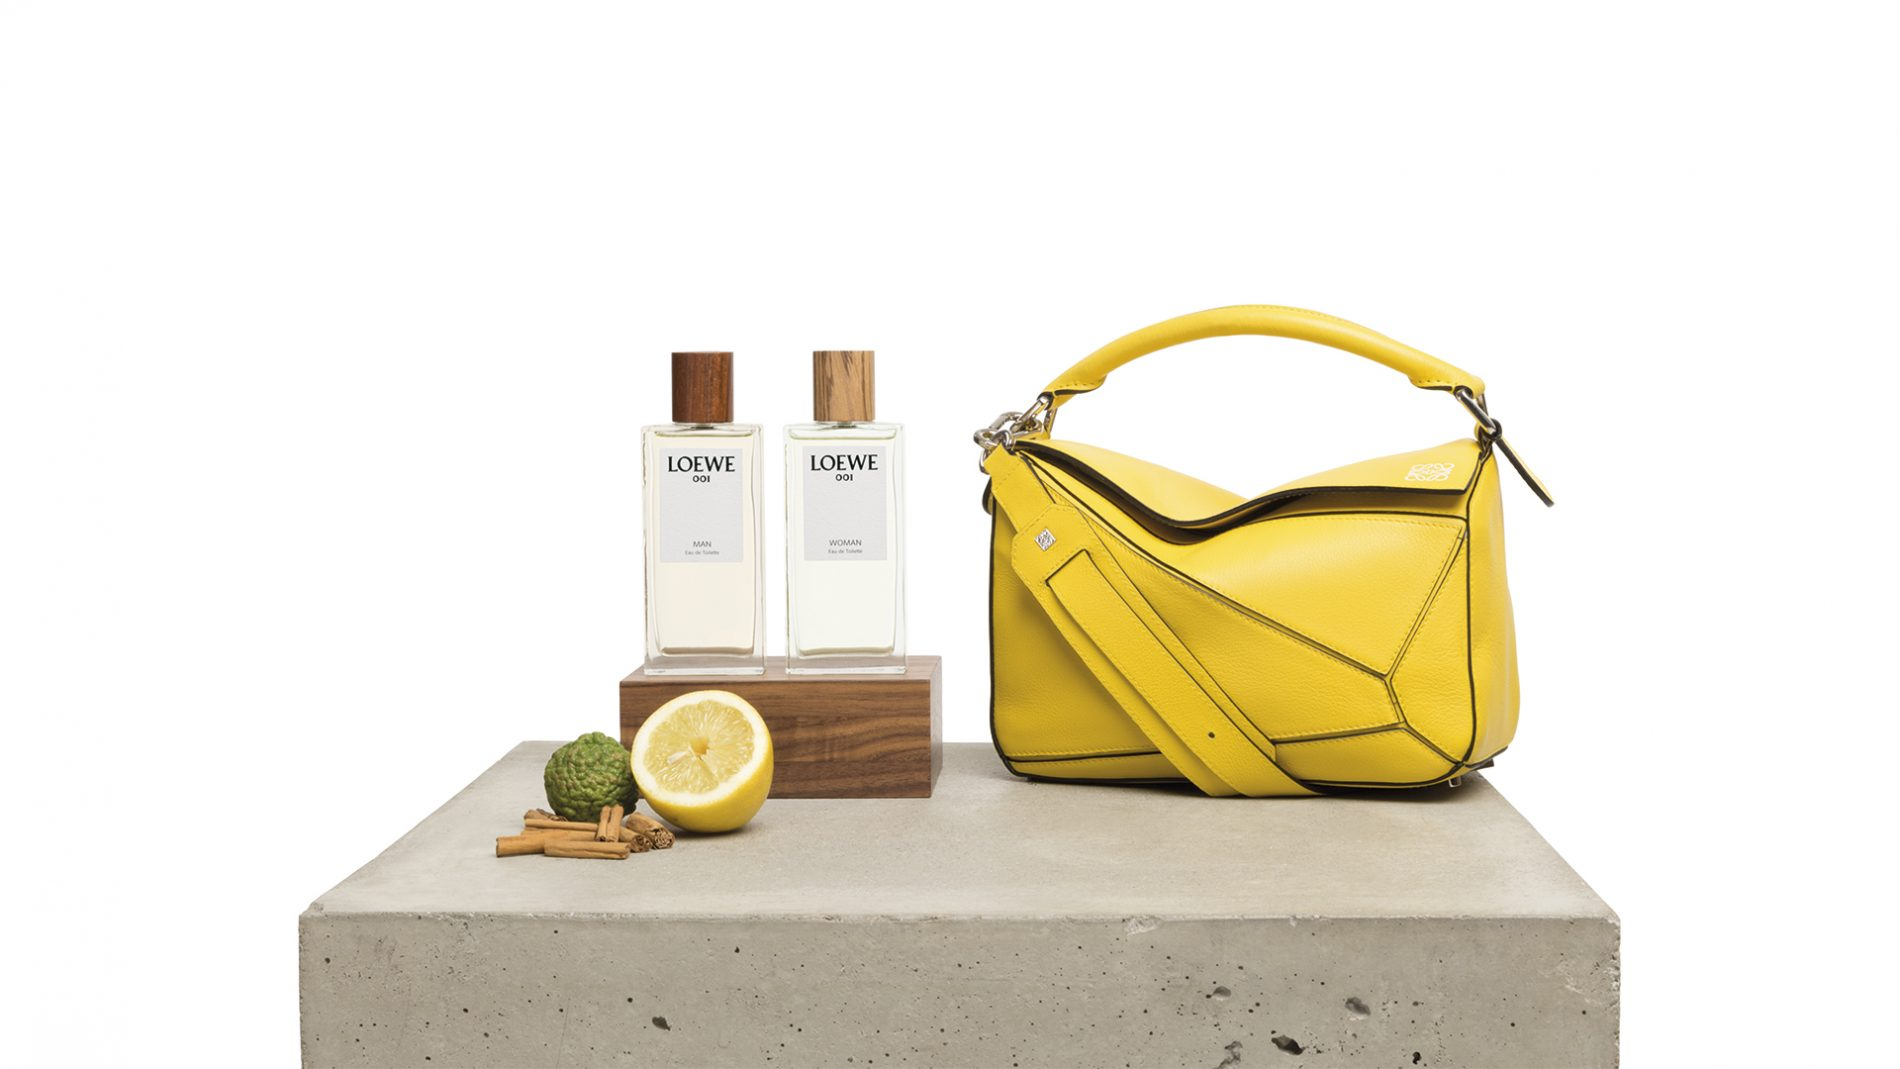 El Corte Inglés Beauty Fragrance Loewe 001